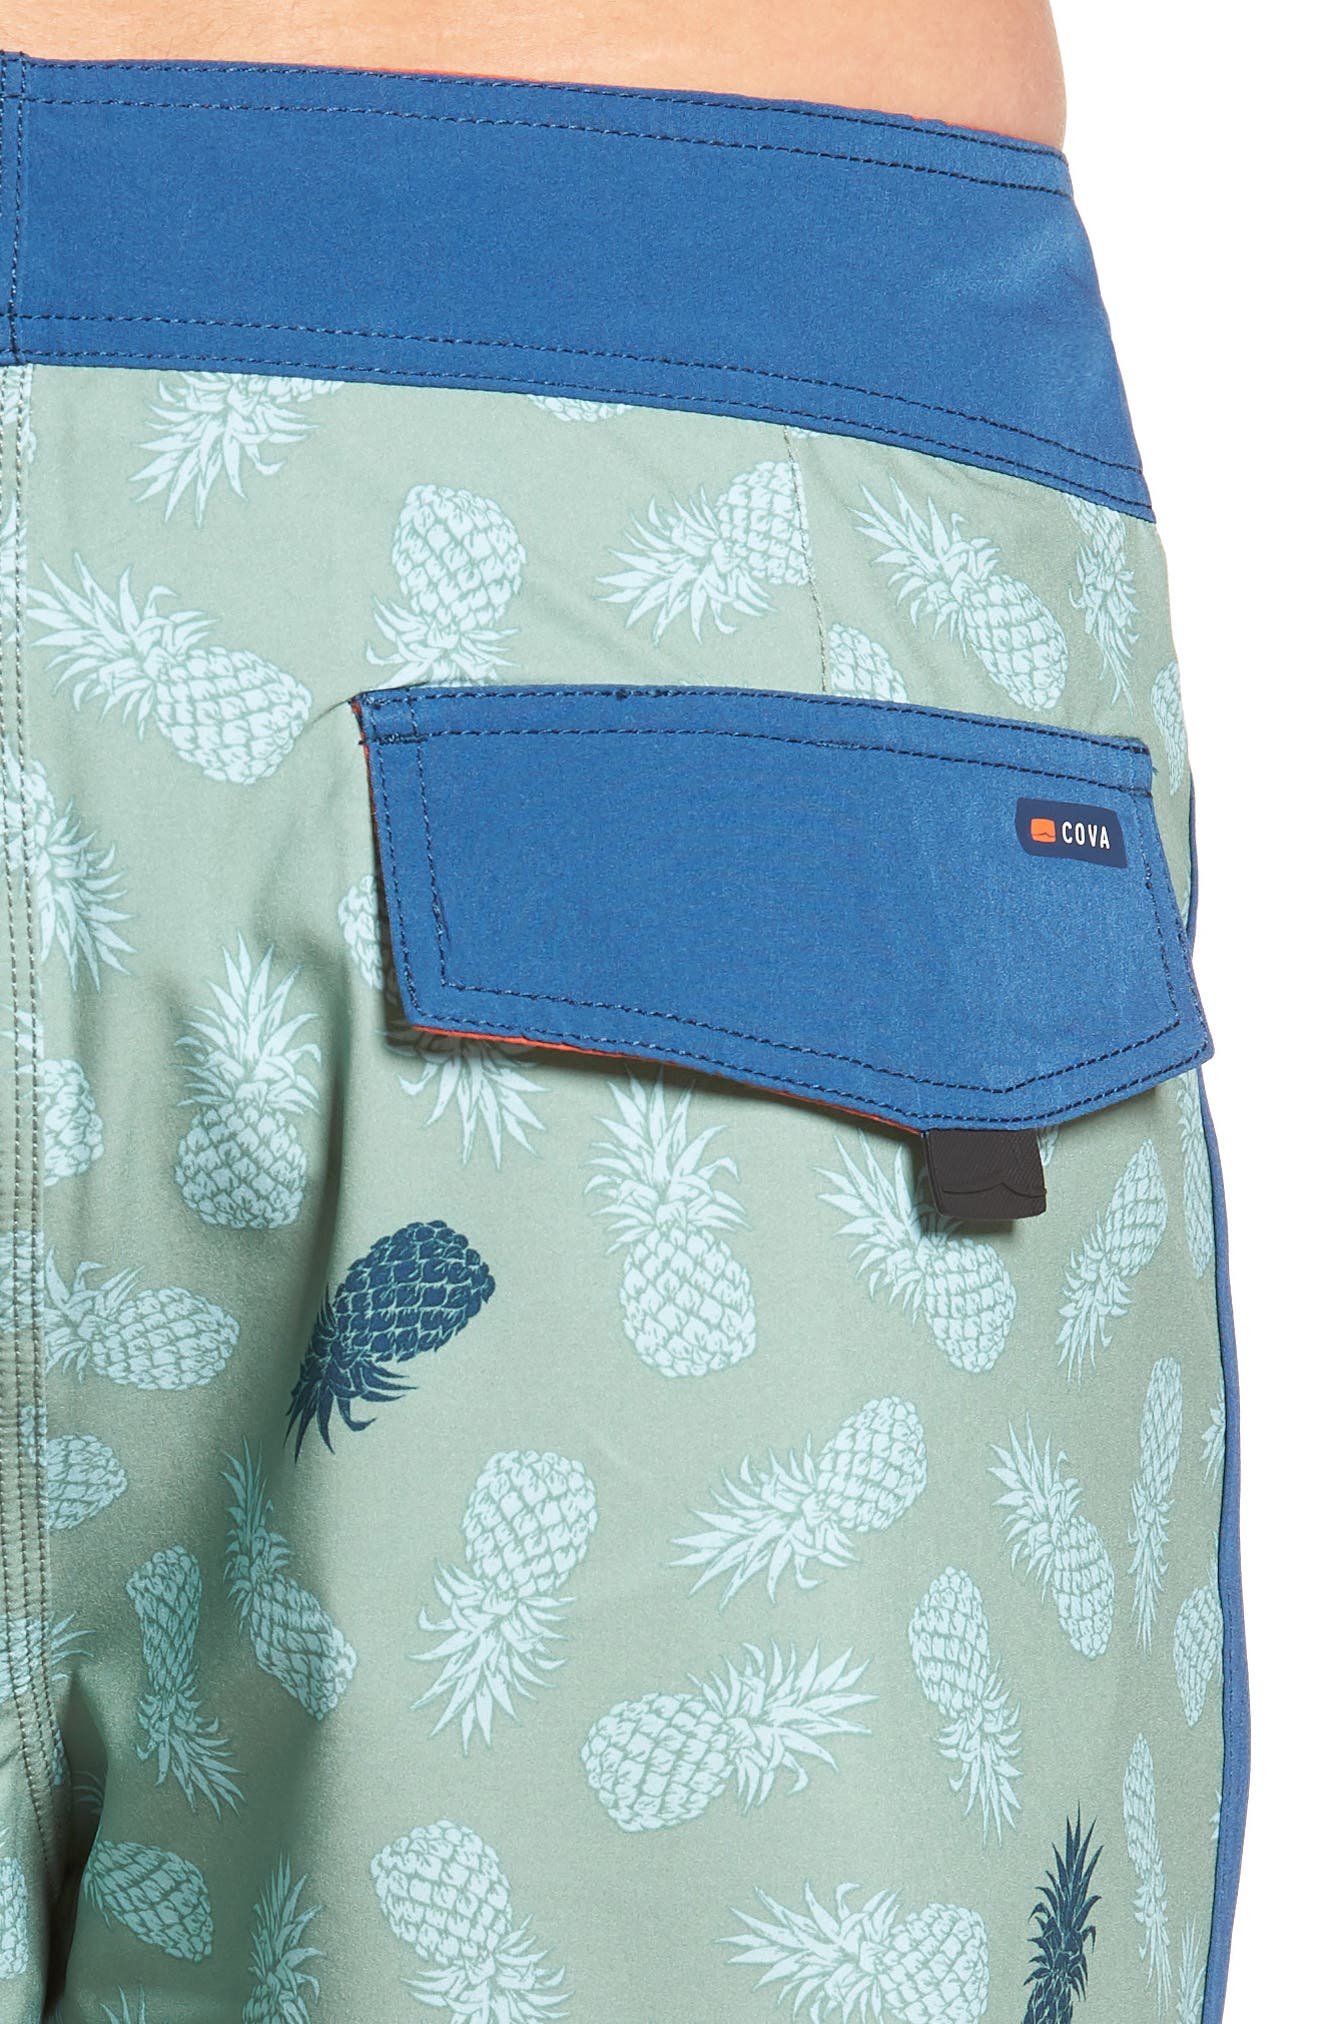 Colada Regular Fit Board Shorts,                             Alternate thumbnail 4, color,                             BASIL GREEN